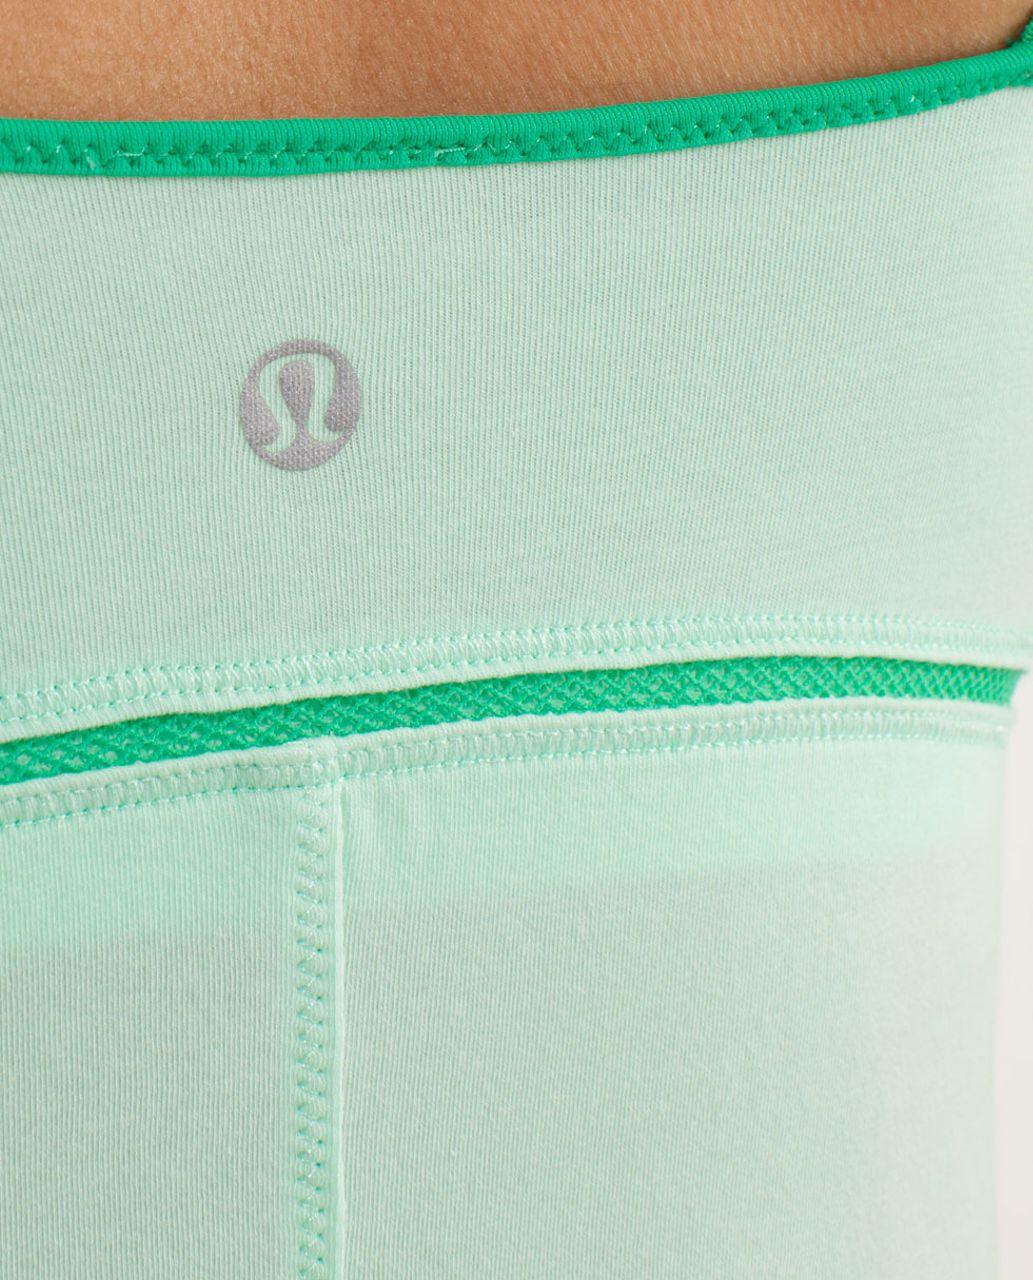 Lululemon Luminous Tank - Fresh Teal / Very Green